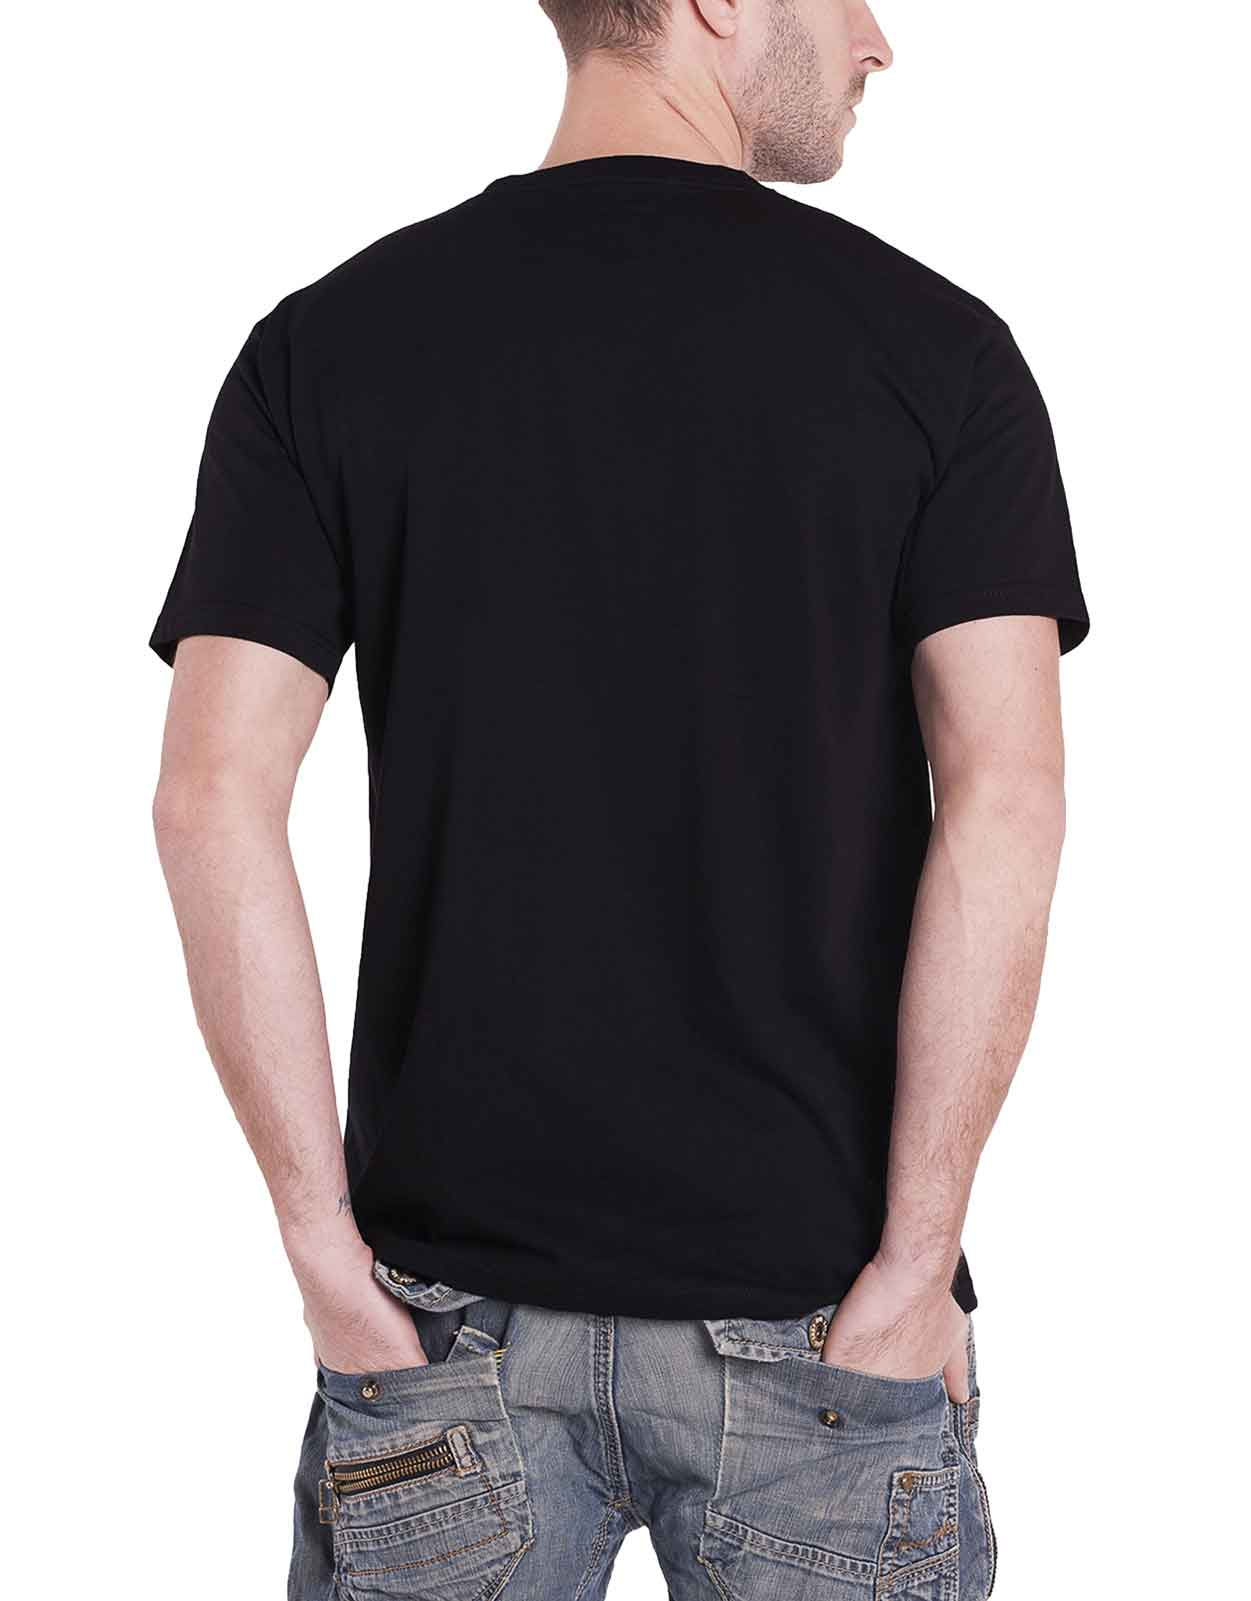 Motorhead-T-Shirt-Lemmy-RIP-England-warpig-clean-your-clock-official-new-mens Indexbild 19